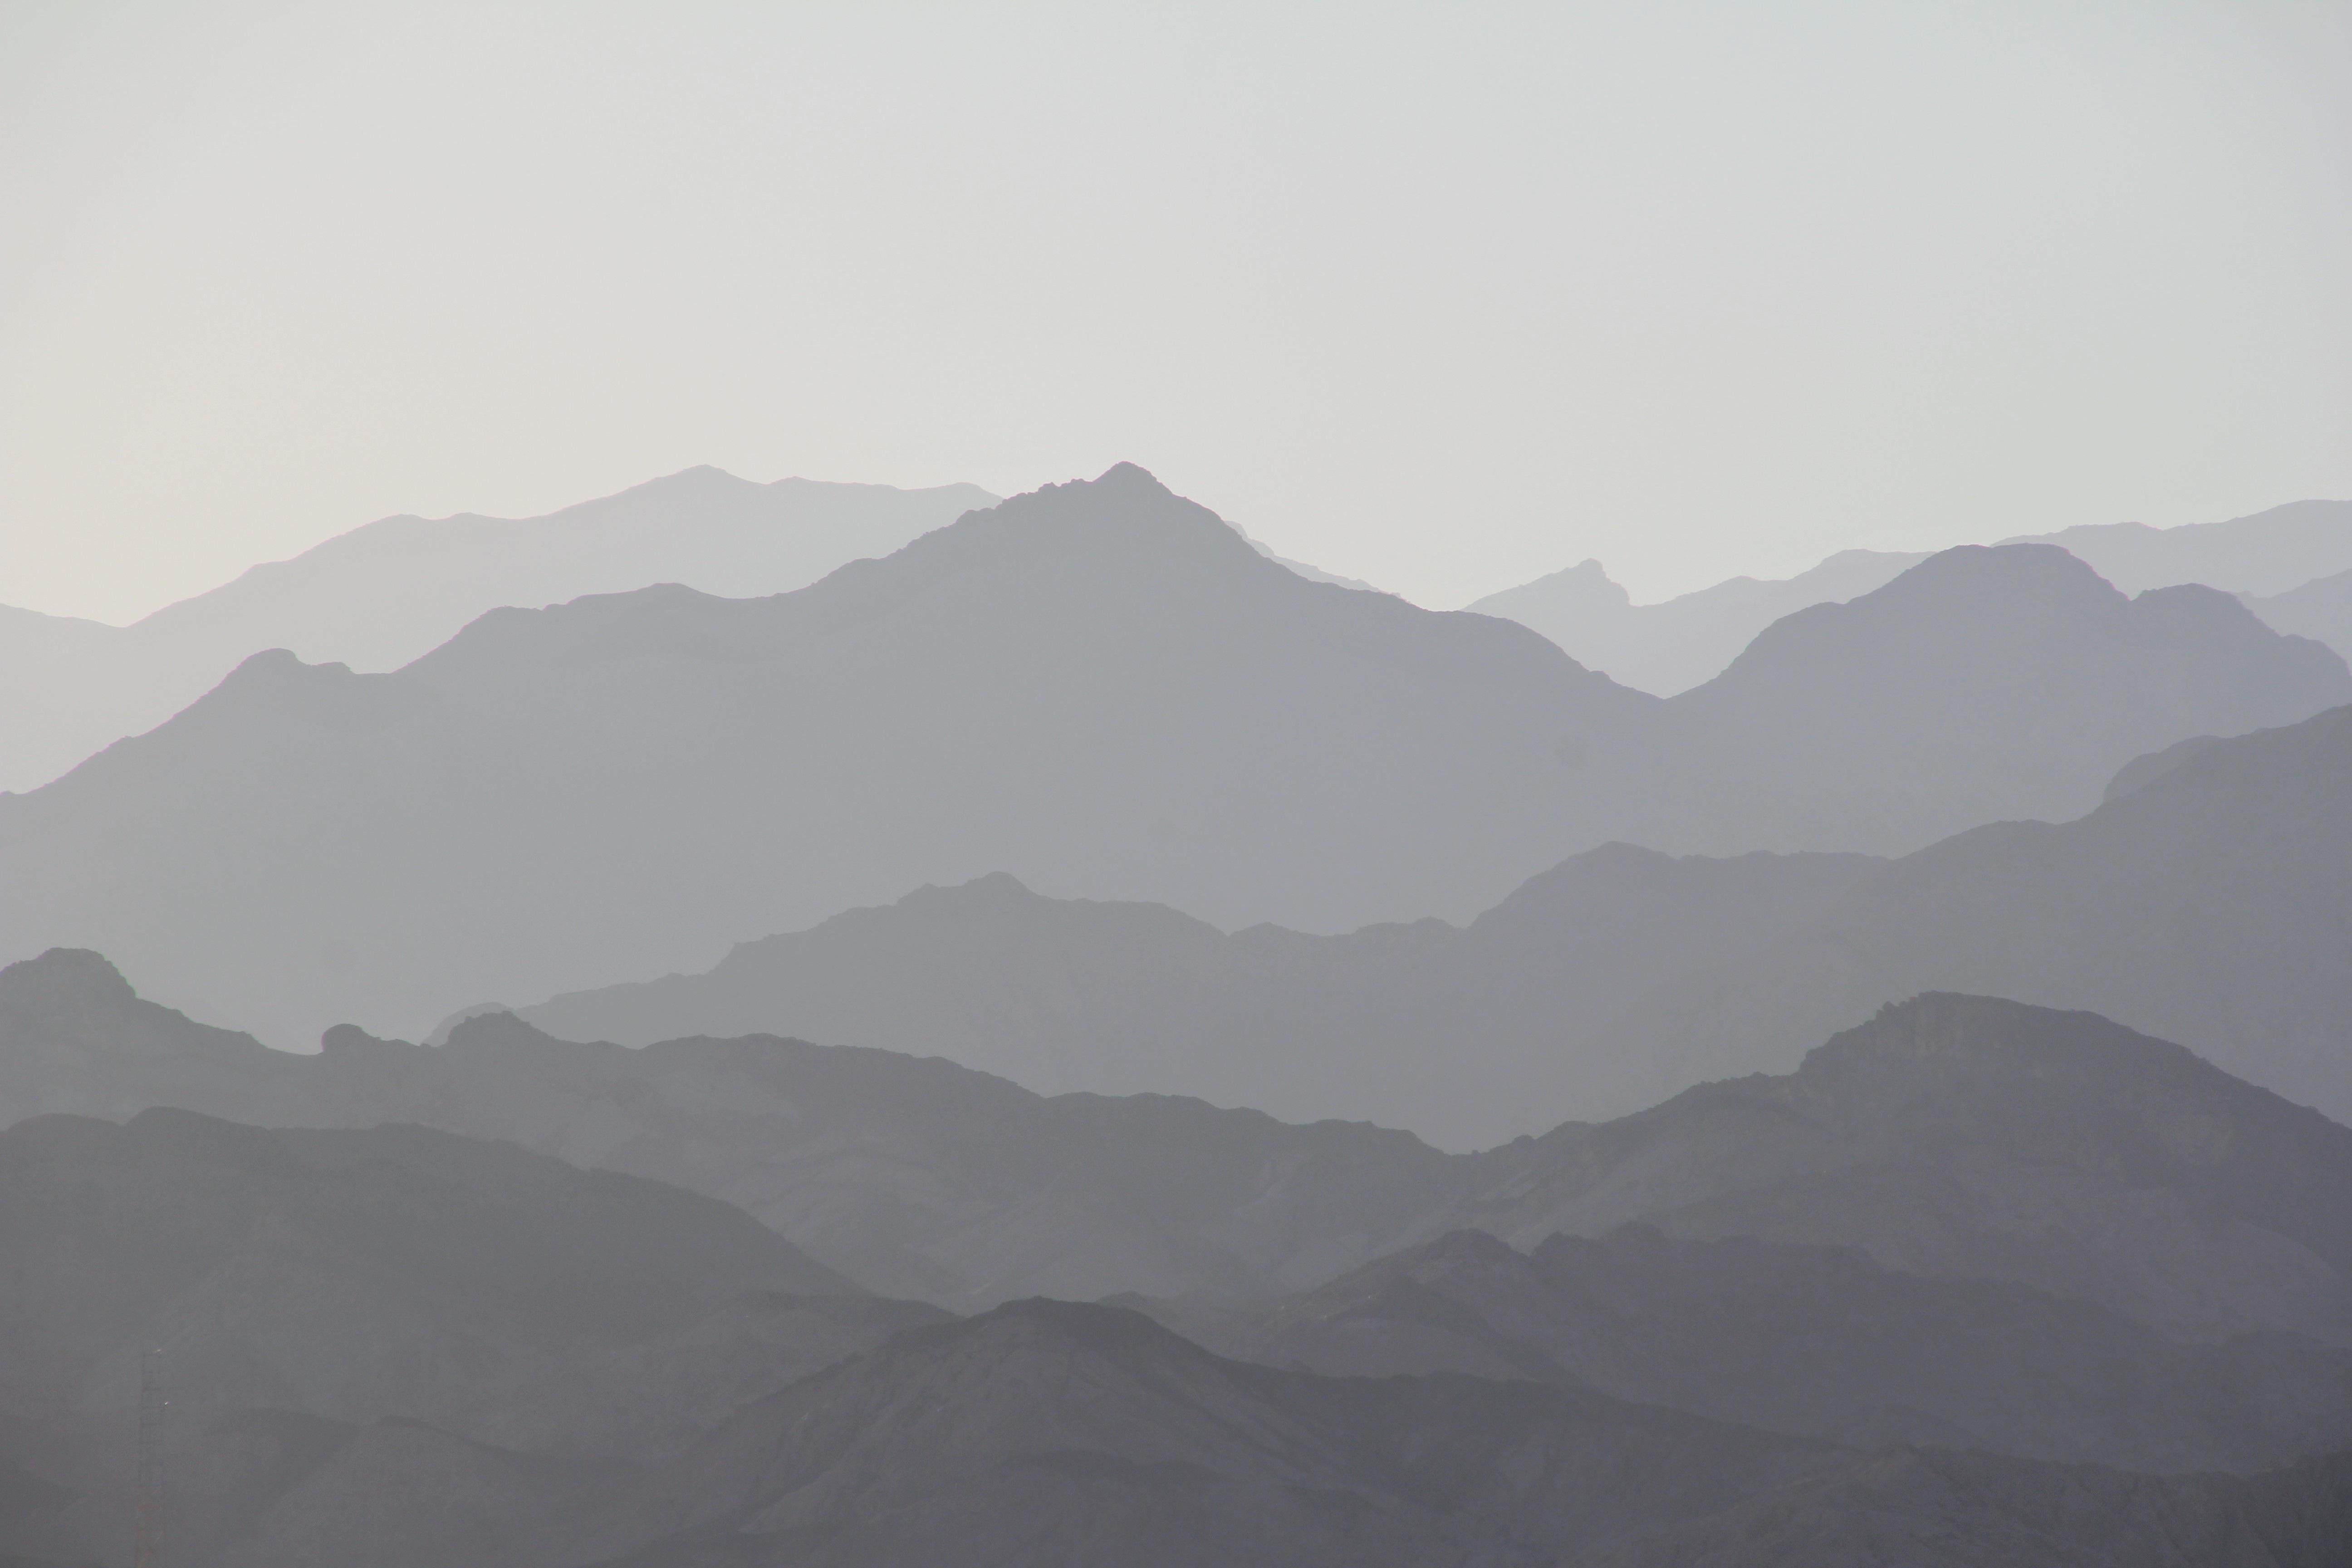 Amazing Wallpaper Mountain Fog - rock-horizon-mountain-fog-mist-morning-hill-wave-dawn-valley-mountain-range-shadow-haze-ridge-summit-illuminated-background-mountains-plateau-wallpaper-fell-layer-evening-sun-hilly-mountainous-landform-highest-peak-geographical-feature-atmospheric-phenomenon-mountainous-landforms-1171364  You Should Have_833538.jpg